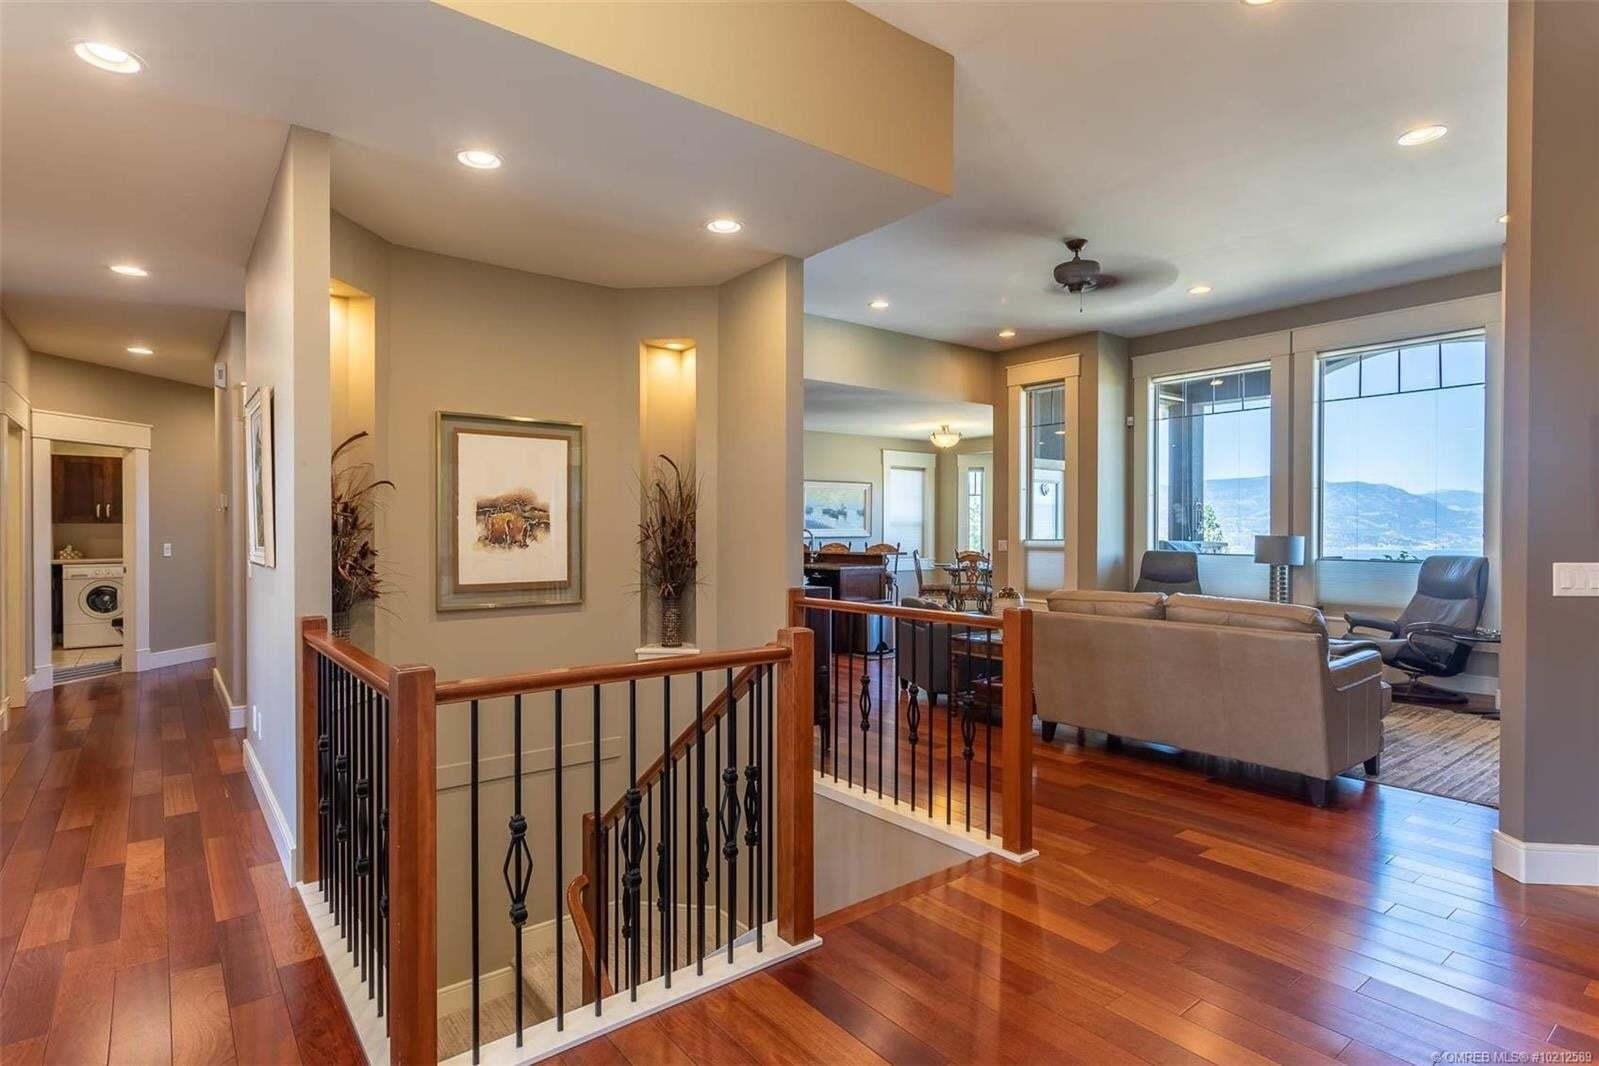 House for sale at 614 Arbor View Dr Kelowna British Columbia - MLS: 10212589